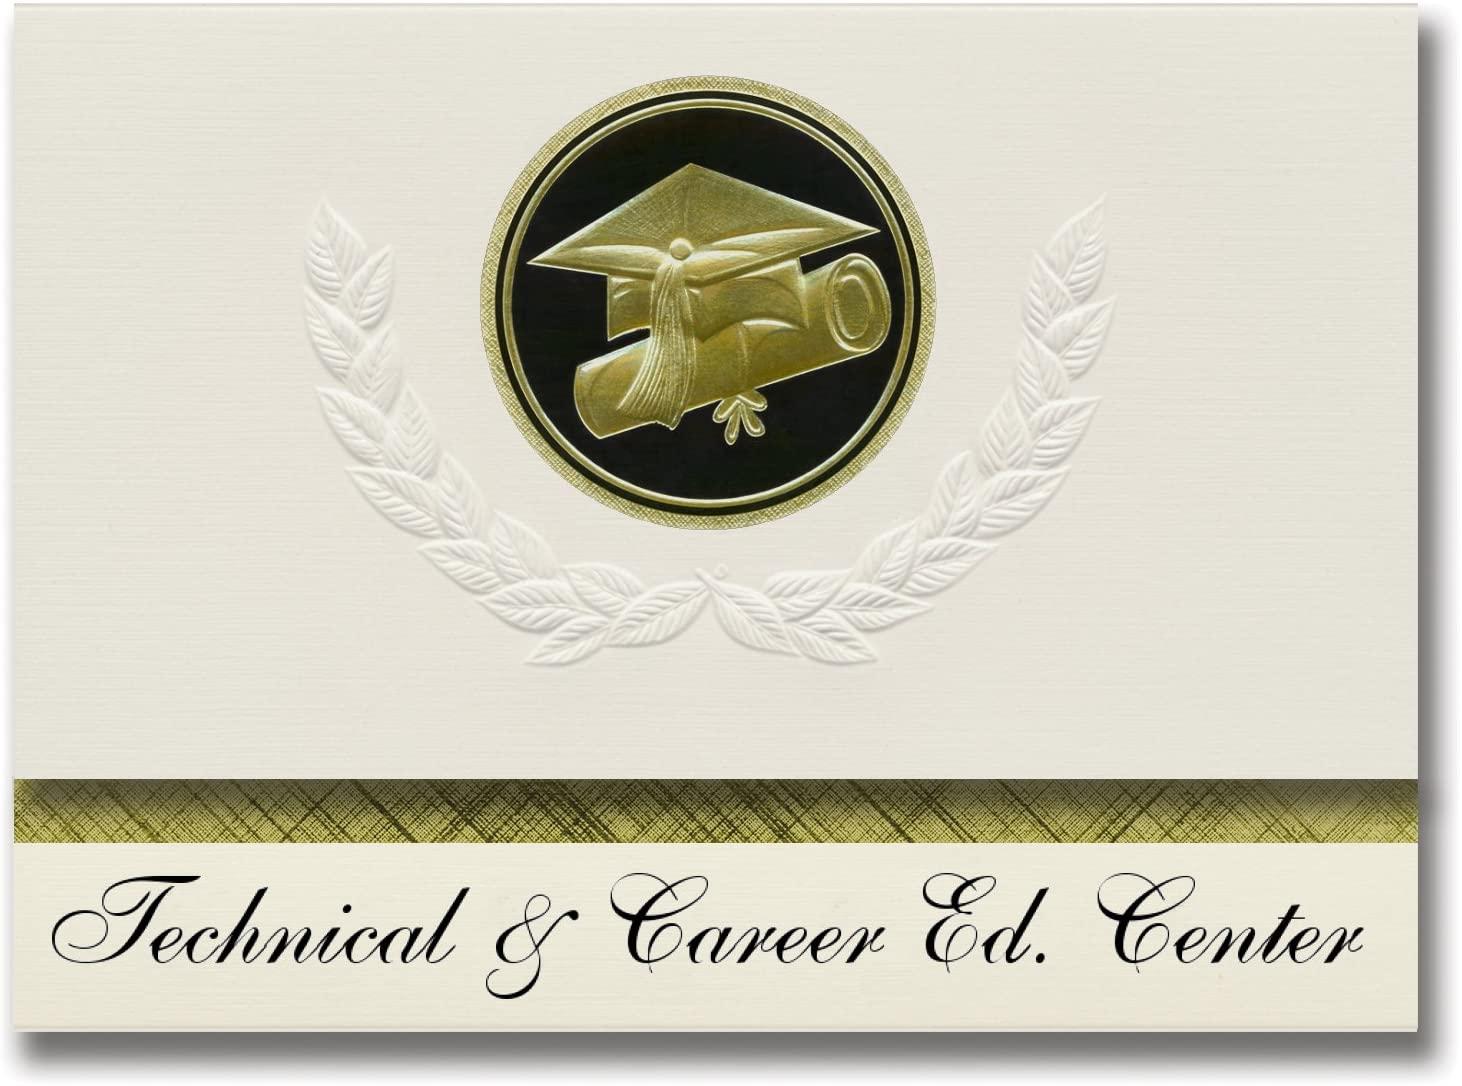 Signature Announcements Technical & Career Ed. Center (Virginia Beach, VA) Graduation Announcements, Presidential Basic Pack 25 Cap & Diploma Seal. Black & Gold.